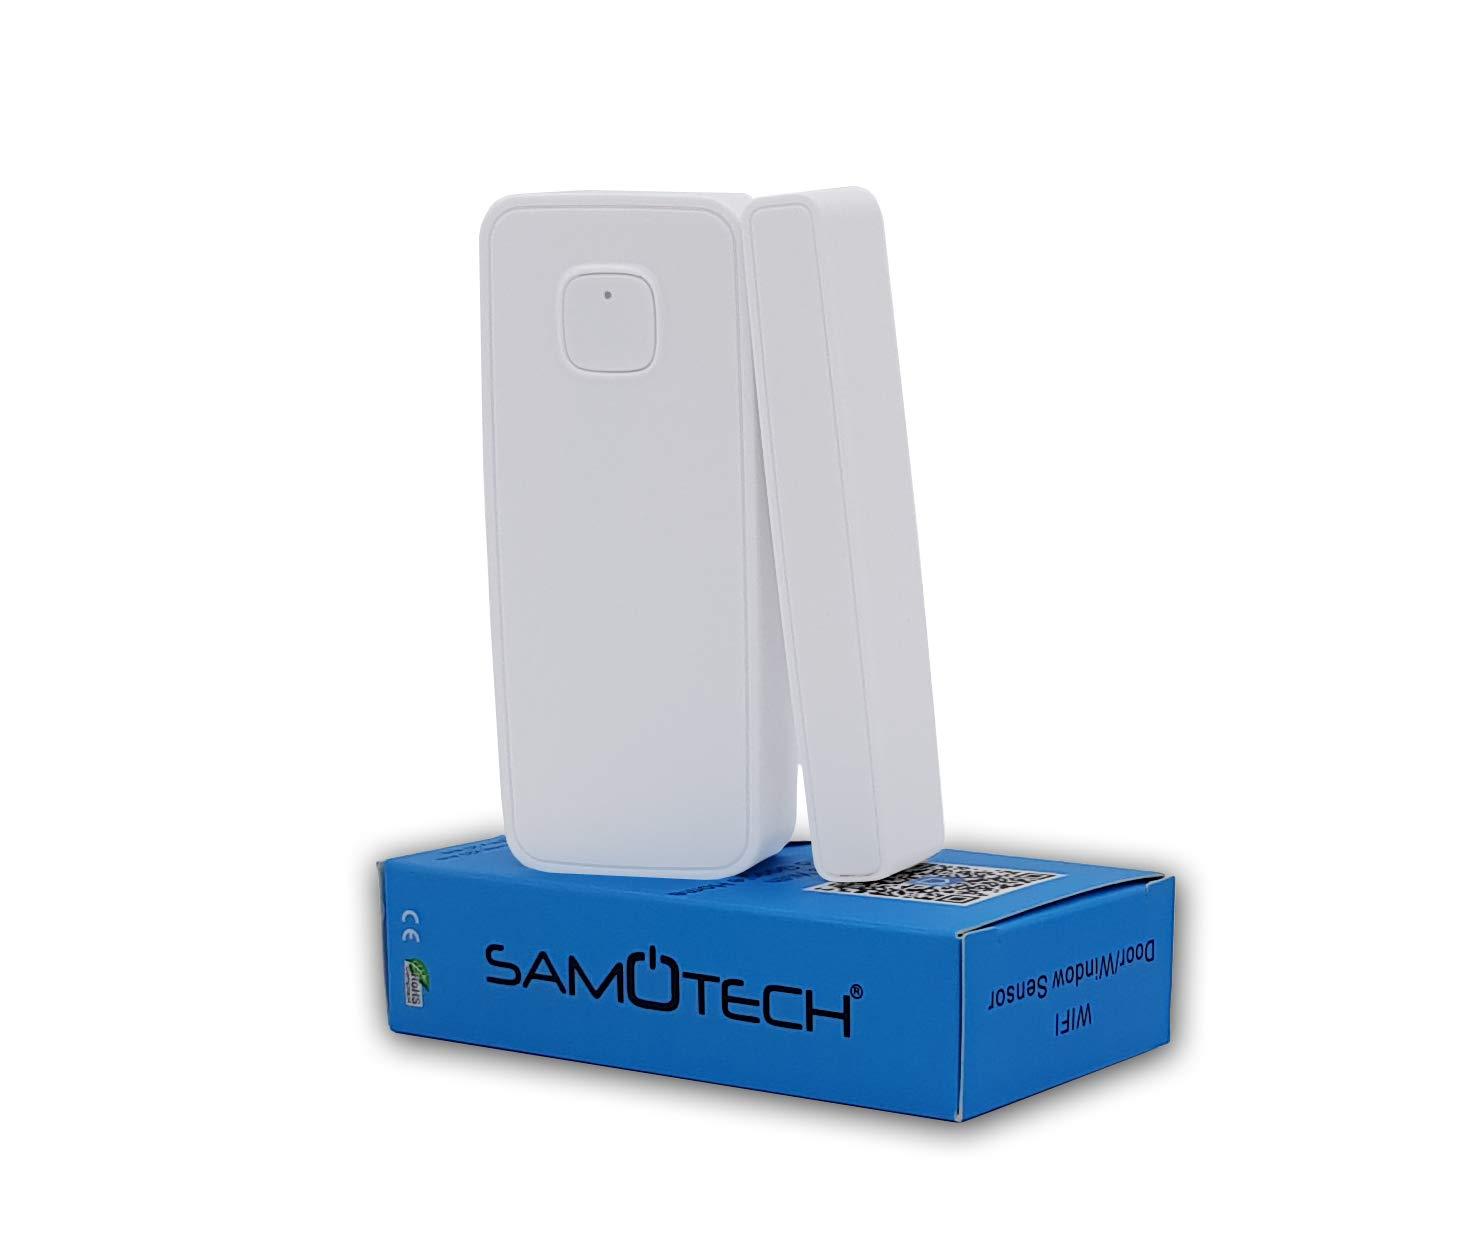 Samotech® - Sensor de WiFi para Puerta y Ventana Tuya